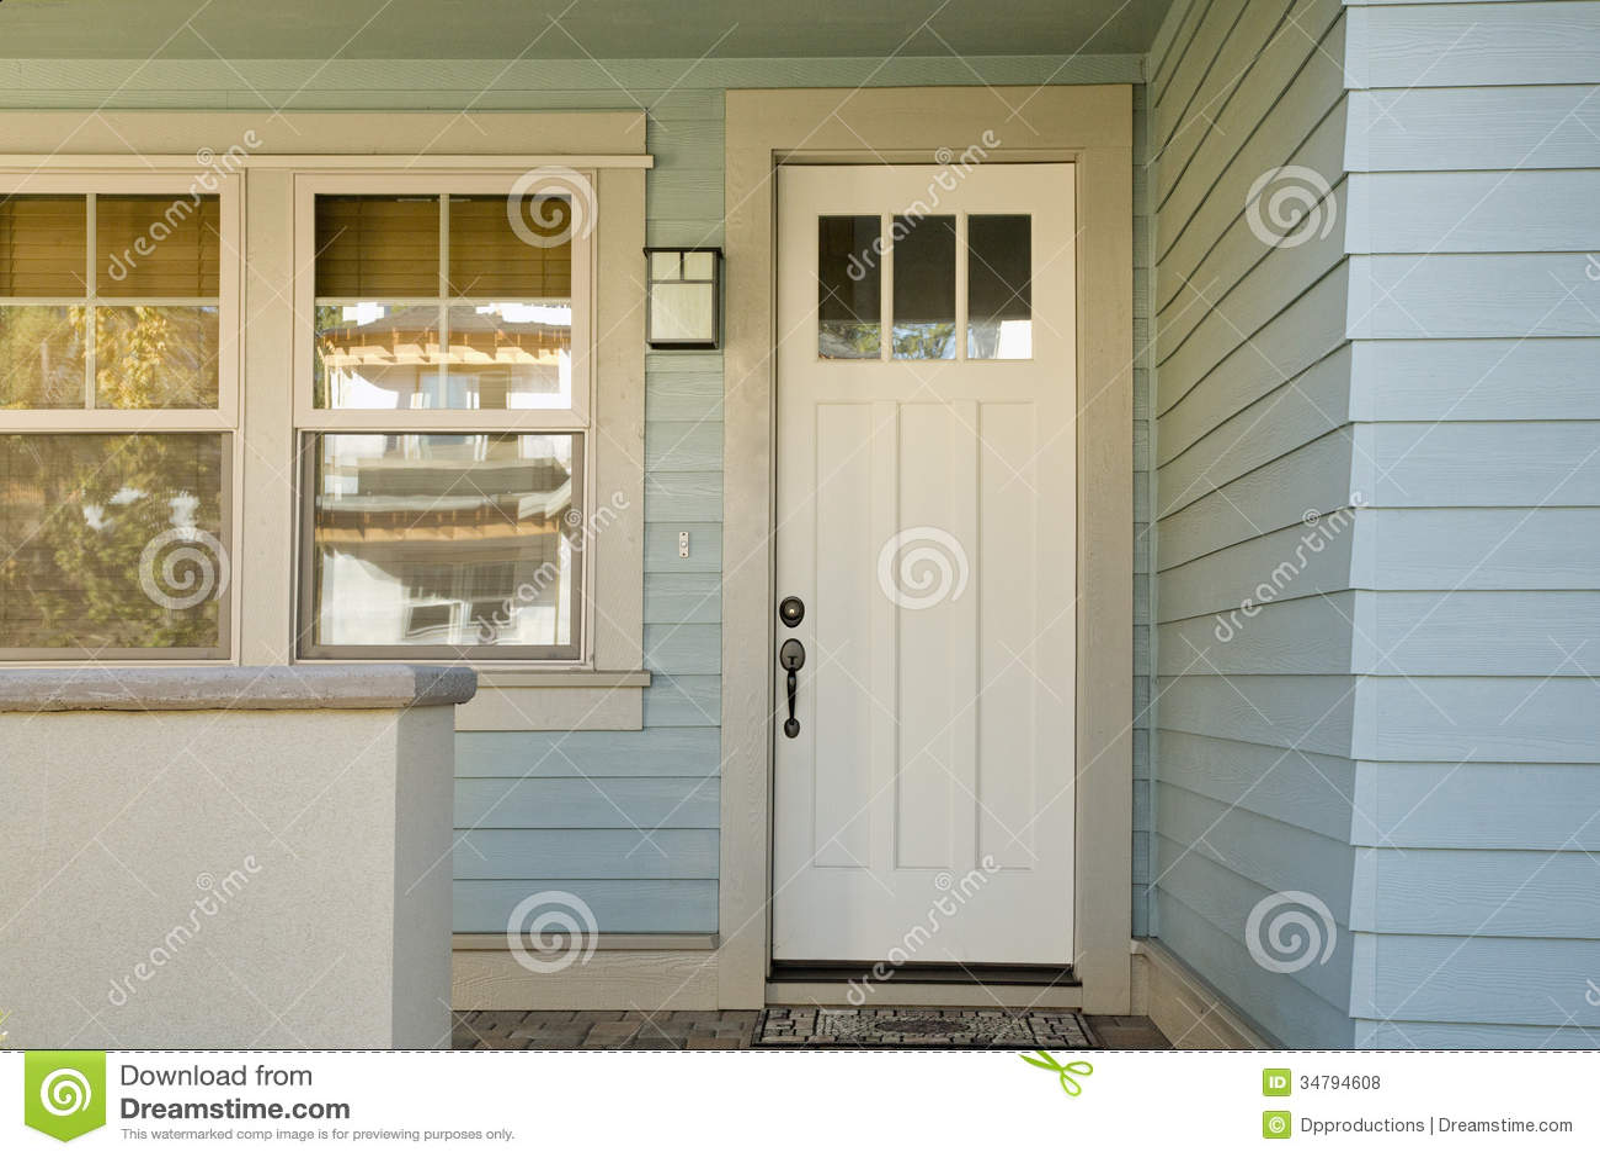 Porte blanche ferm e d une maison - Porte principale maison ...